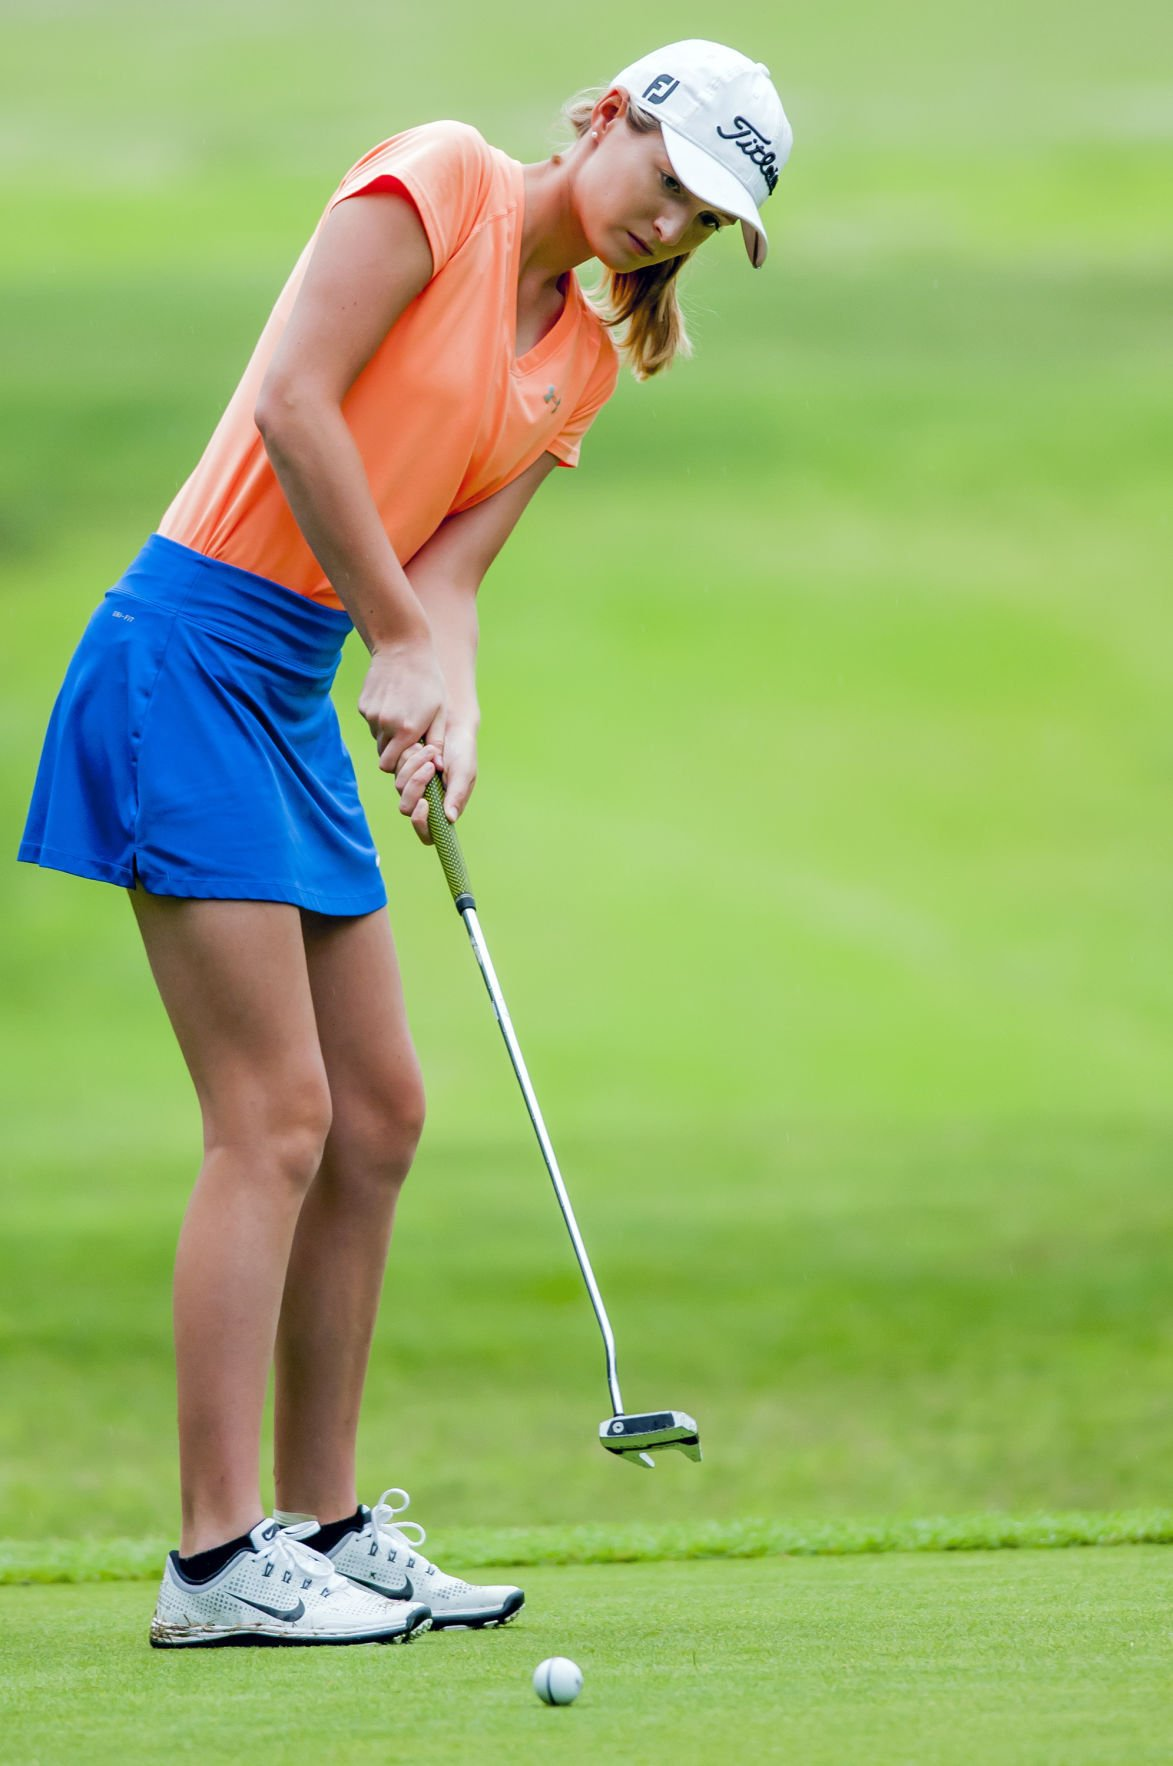 Marlington girls golfers get wins on First Tees Junior Golf Tour - Sports - The